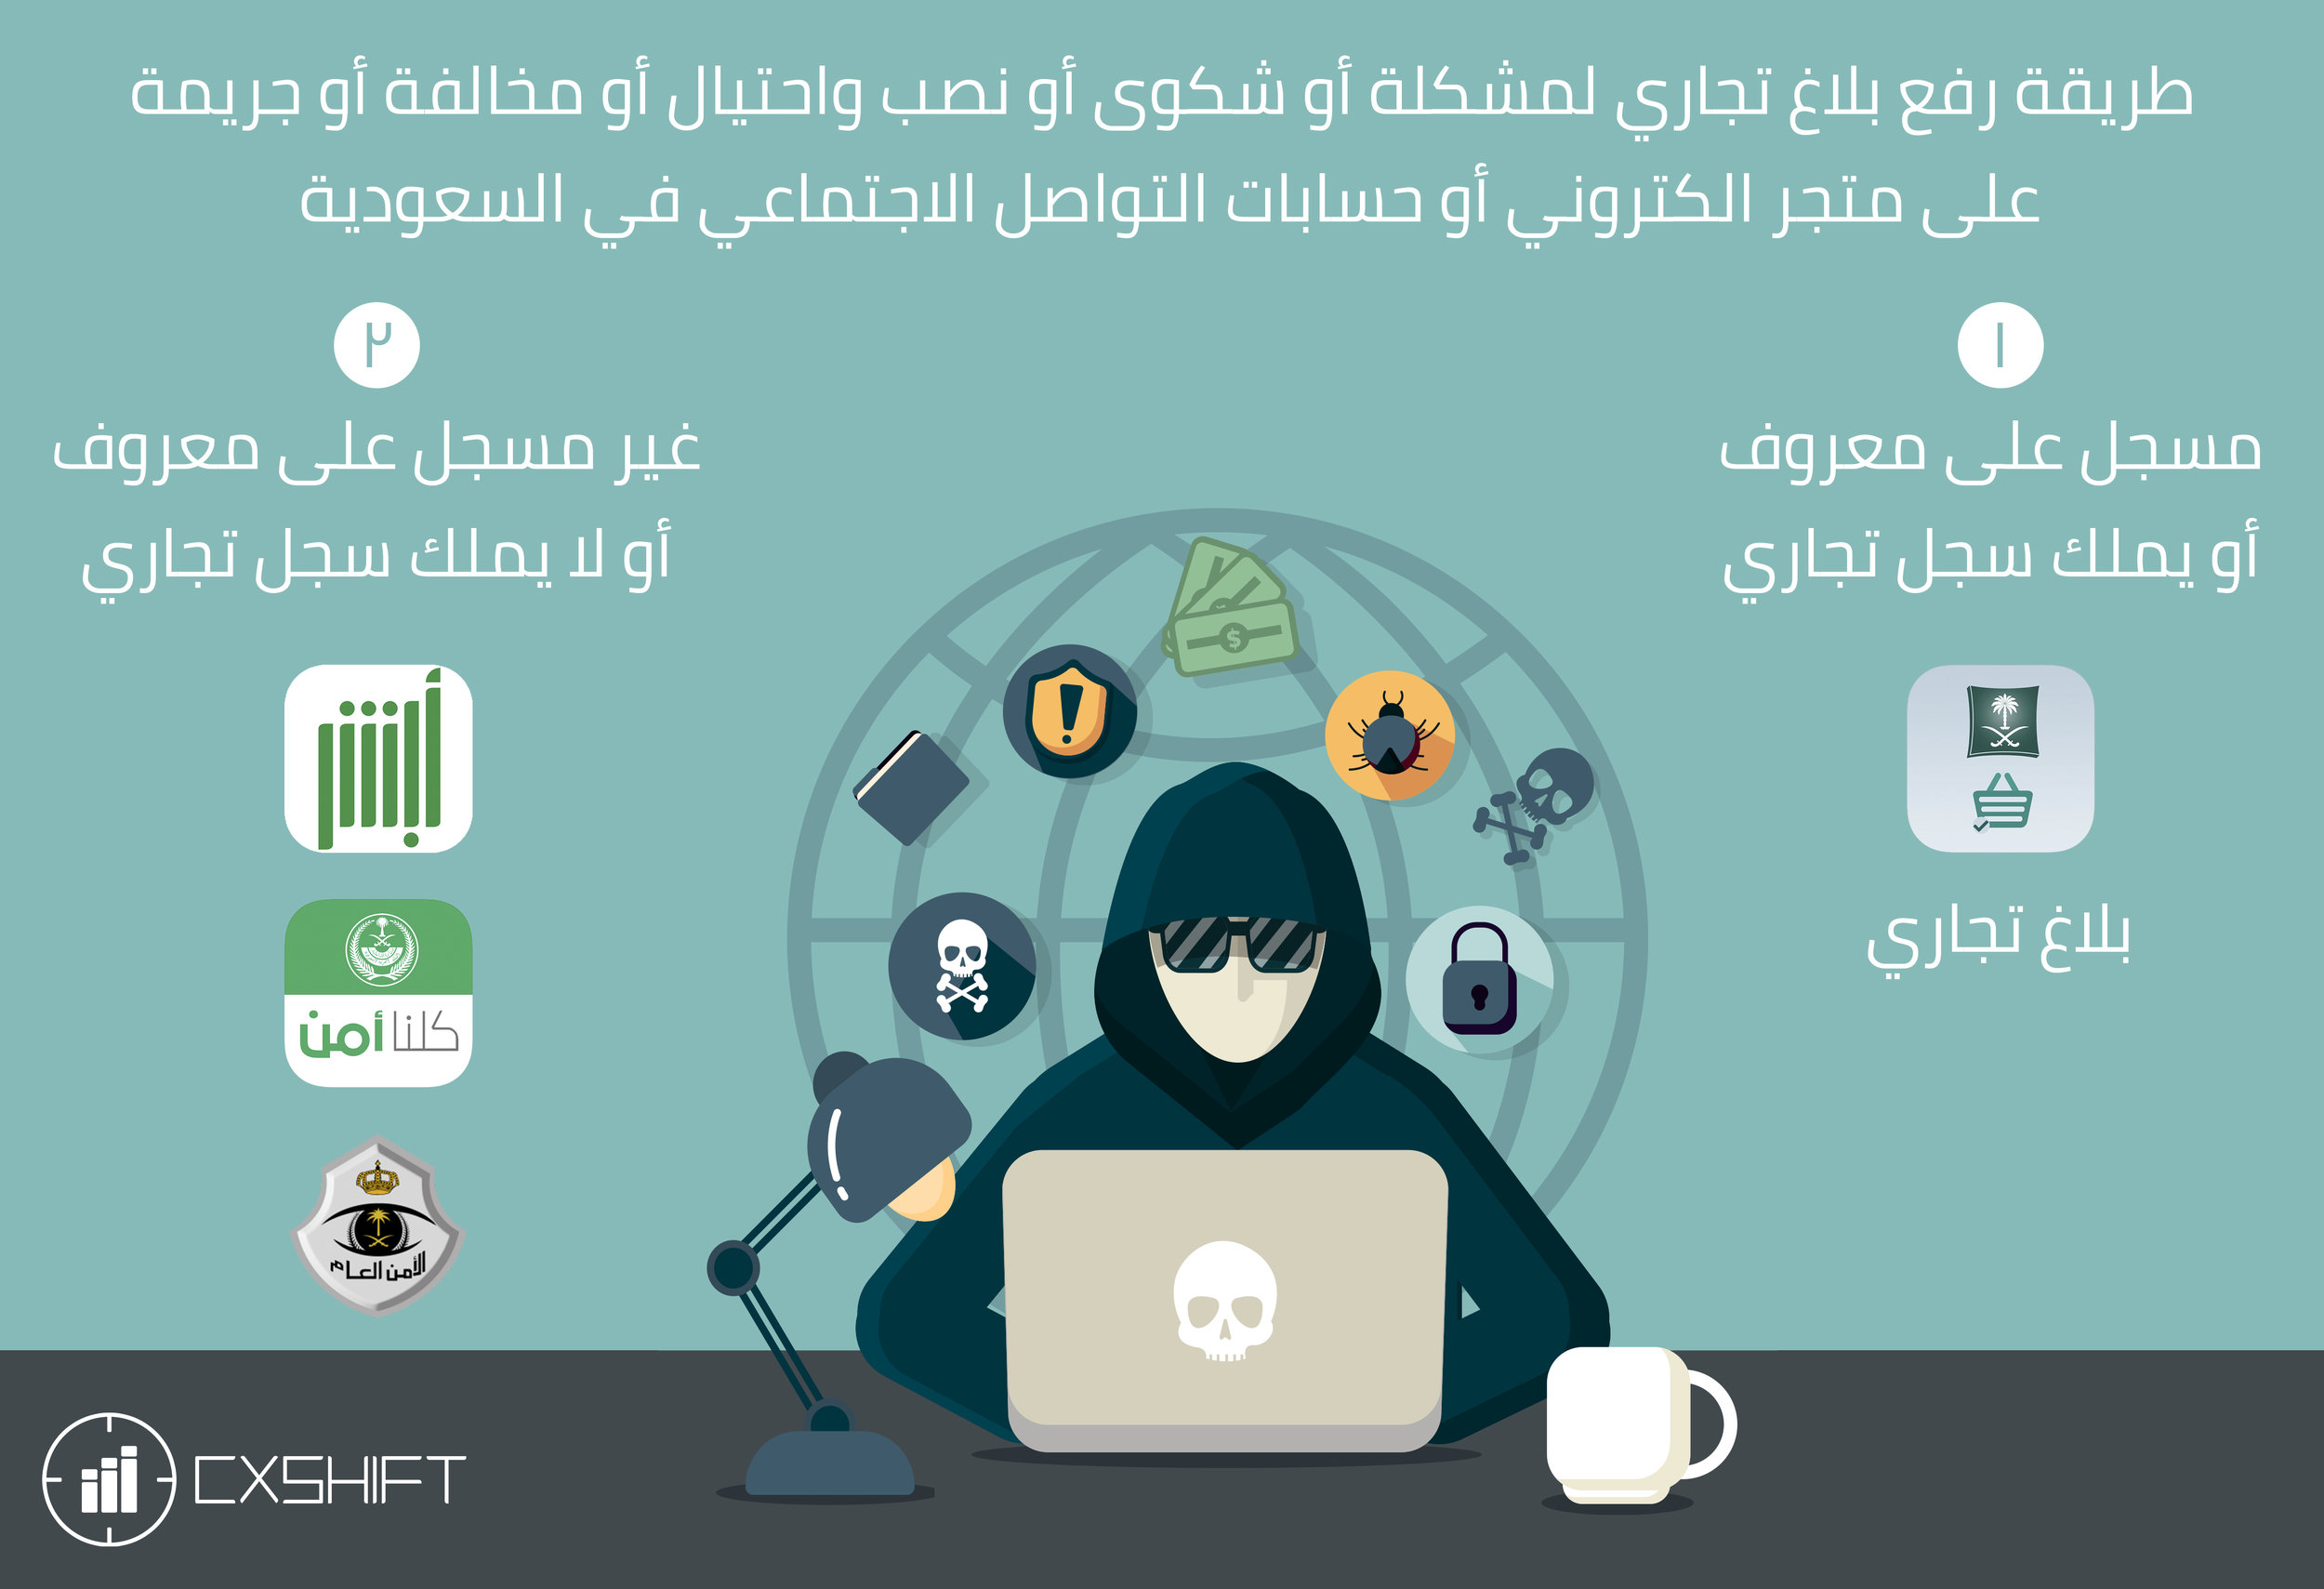 cx shift 1 طريقة رفع بلاغ تجاري على متجر الكتروني أو نصب واحتيال والجرائم الاكتروني في السعودية.jpg